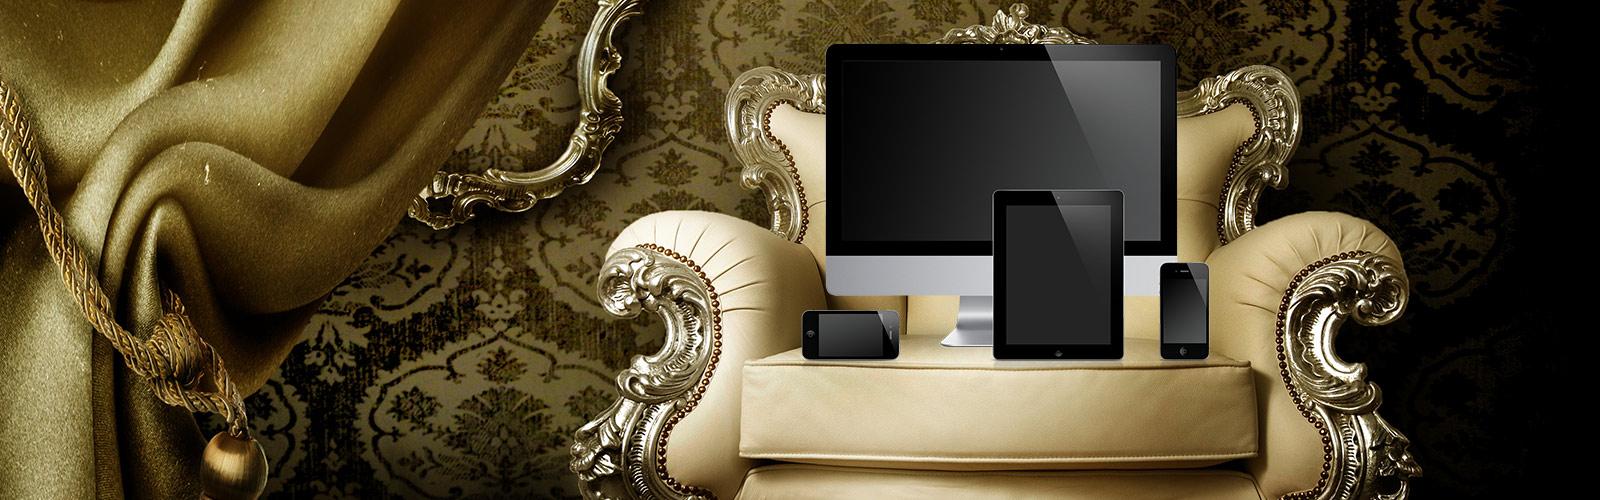 luxury-Internet-seat-1600x500